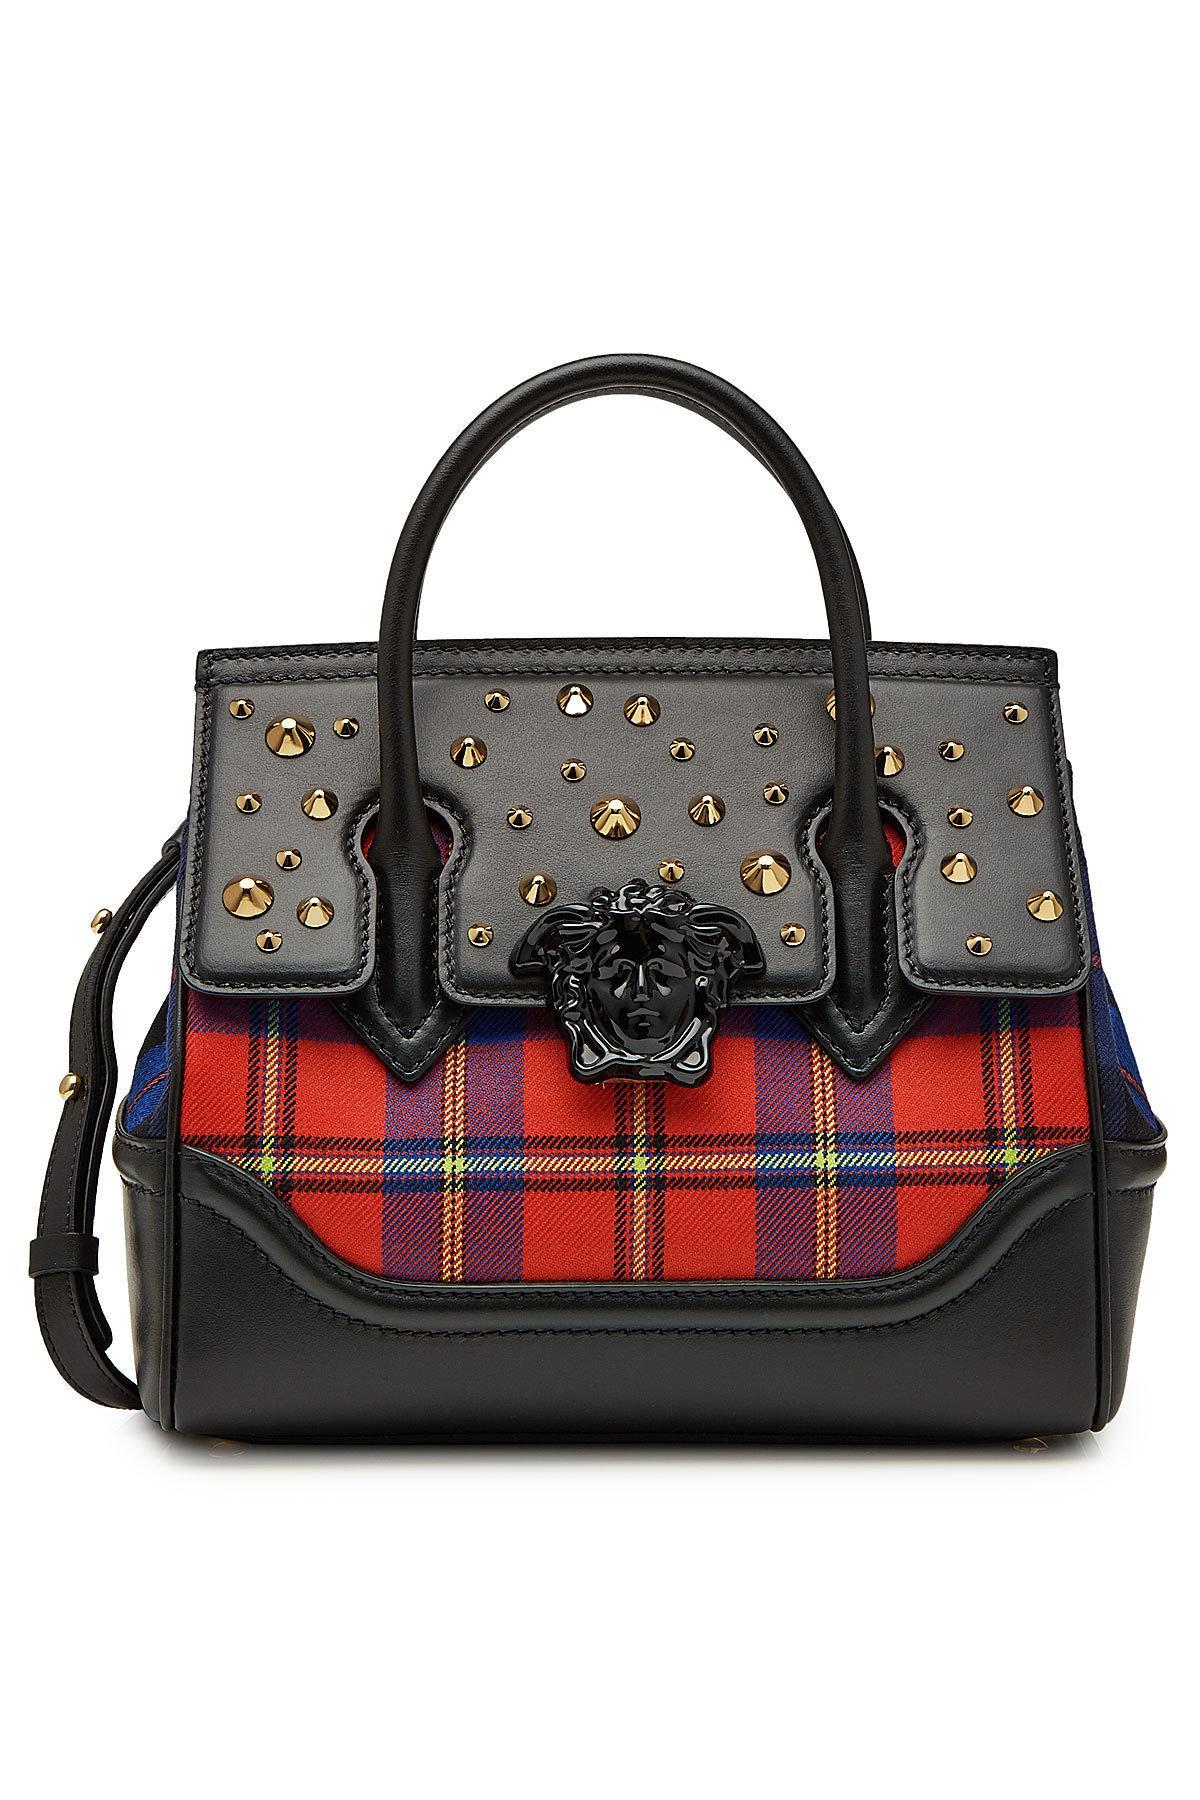 90cf495621 Versace Palazzo Empire Leather Handbag - Lyst